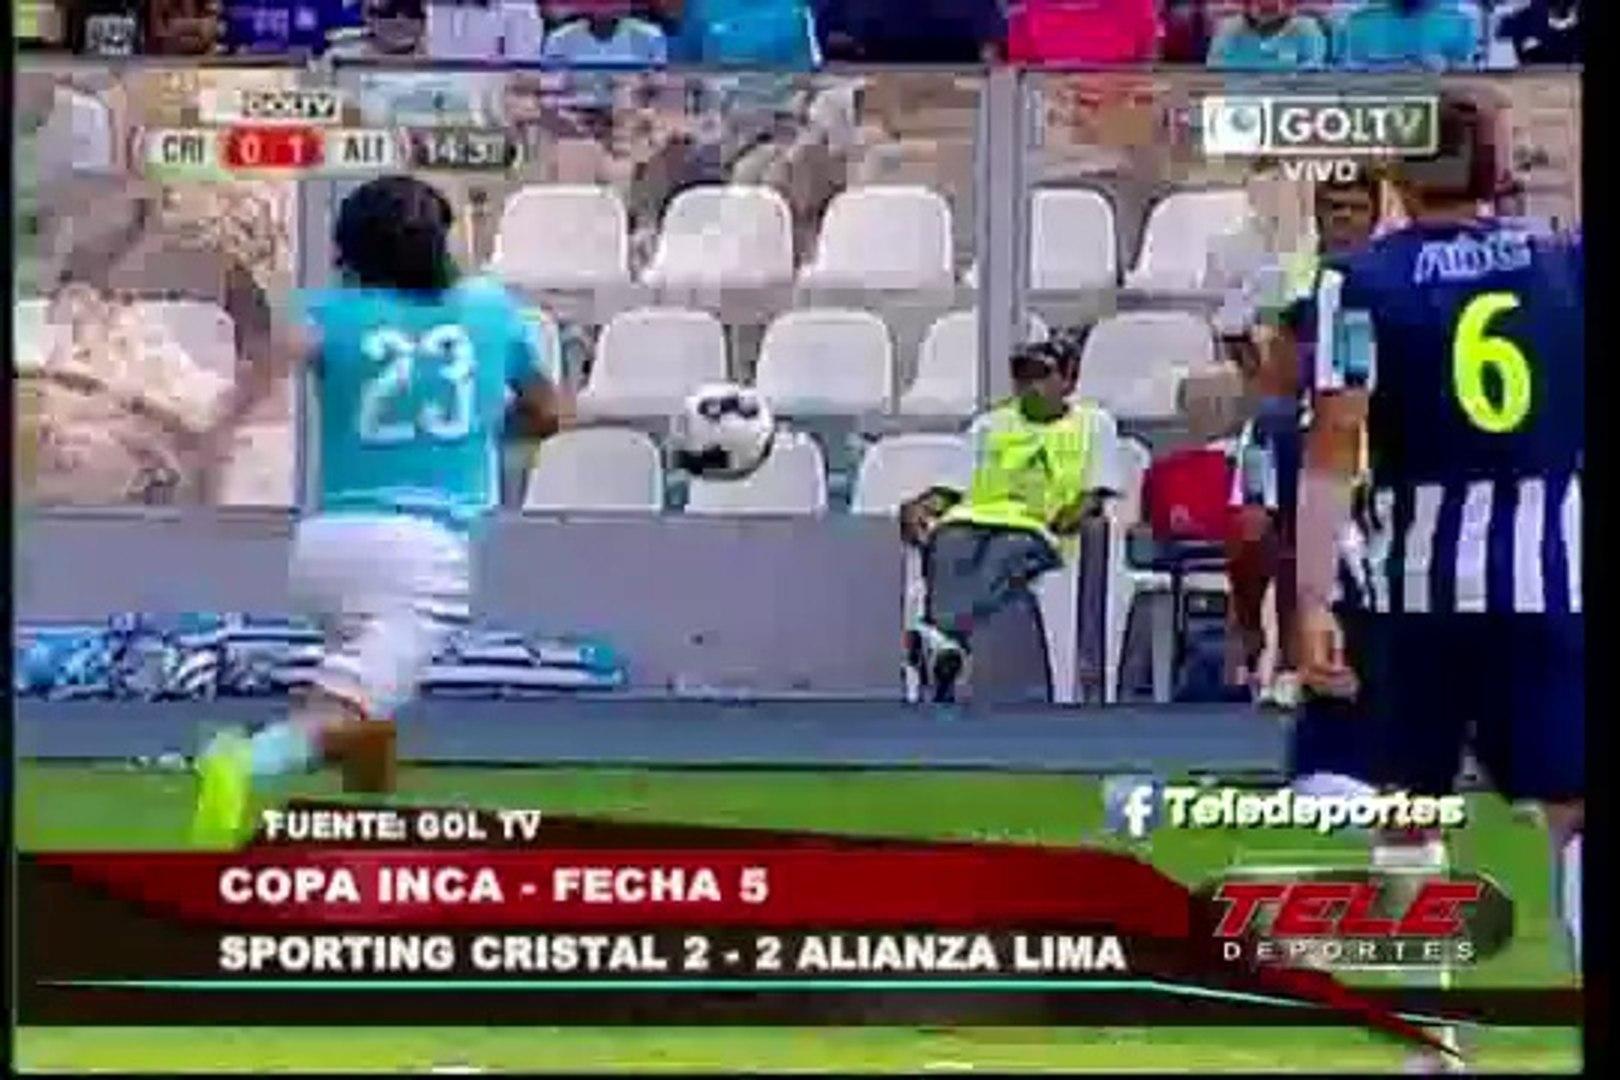 Sporting Cristal-Alianza Lima: repase la 'Fiesta del Fútbol' con la 'Gringa' Bol